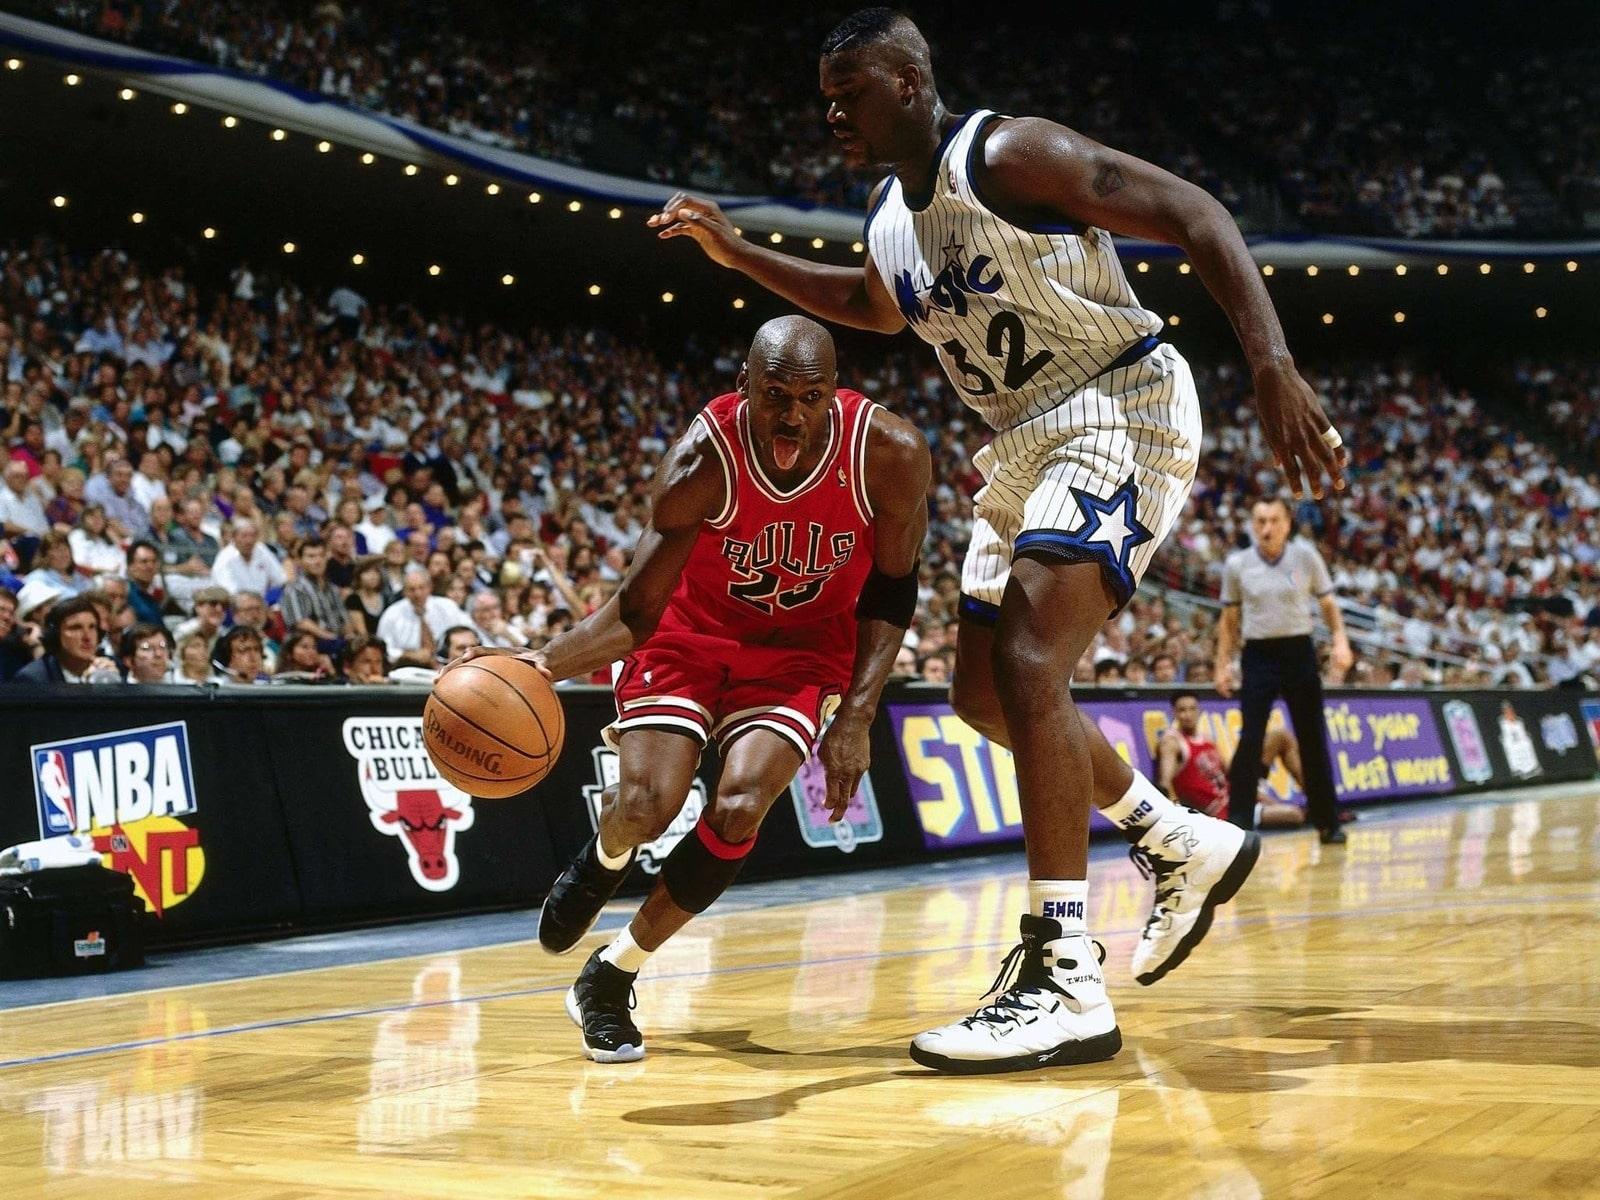 Баскетбол ставка аутсайдера на